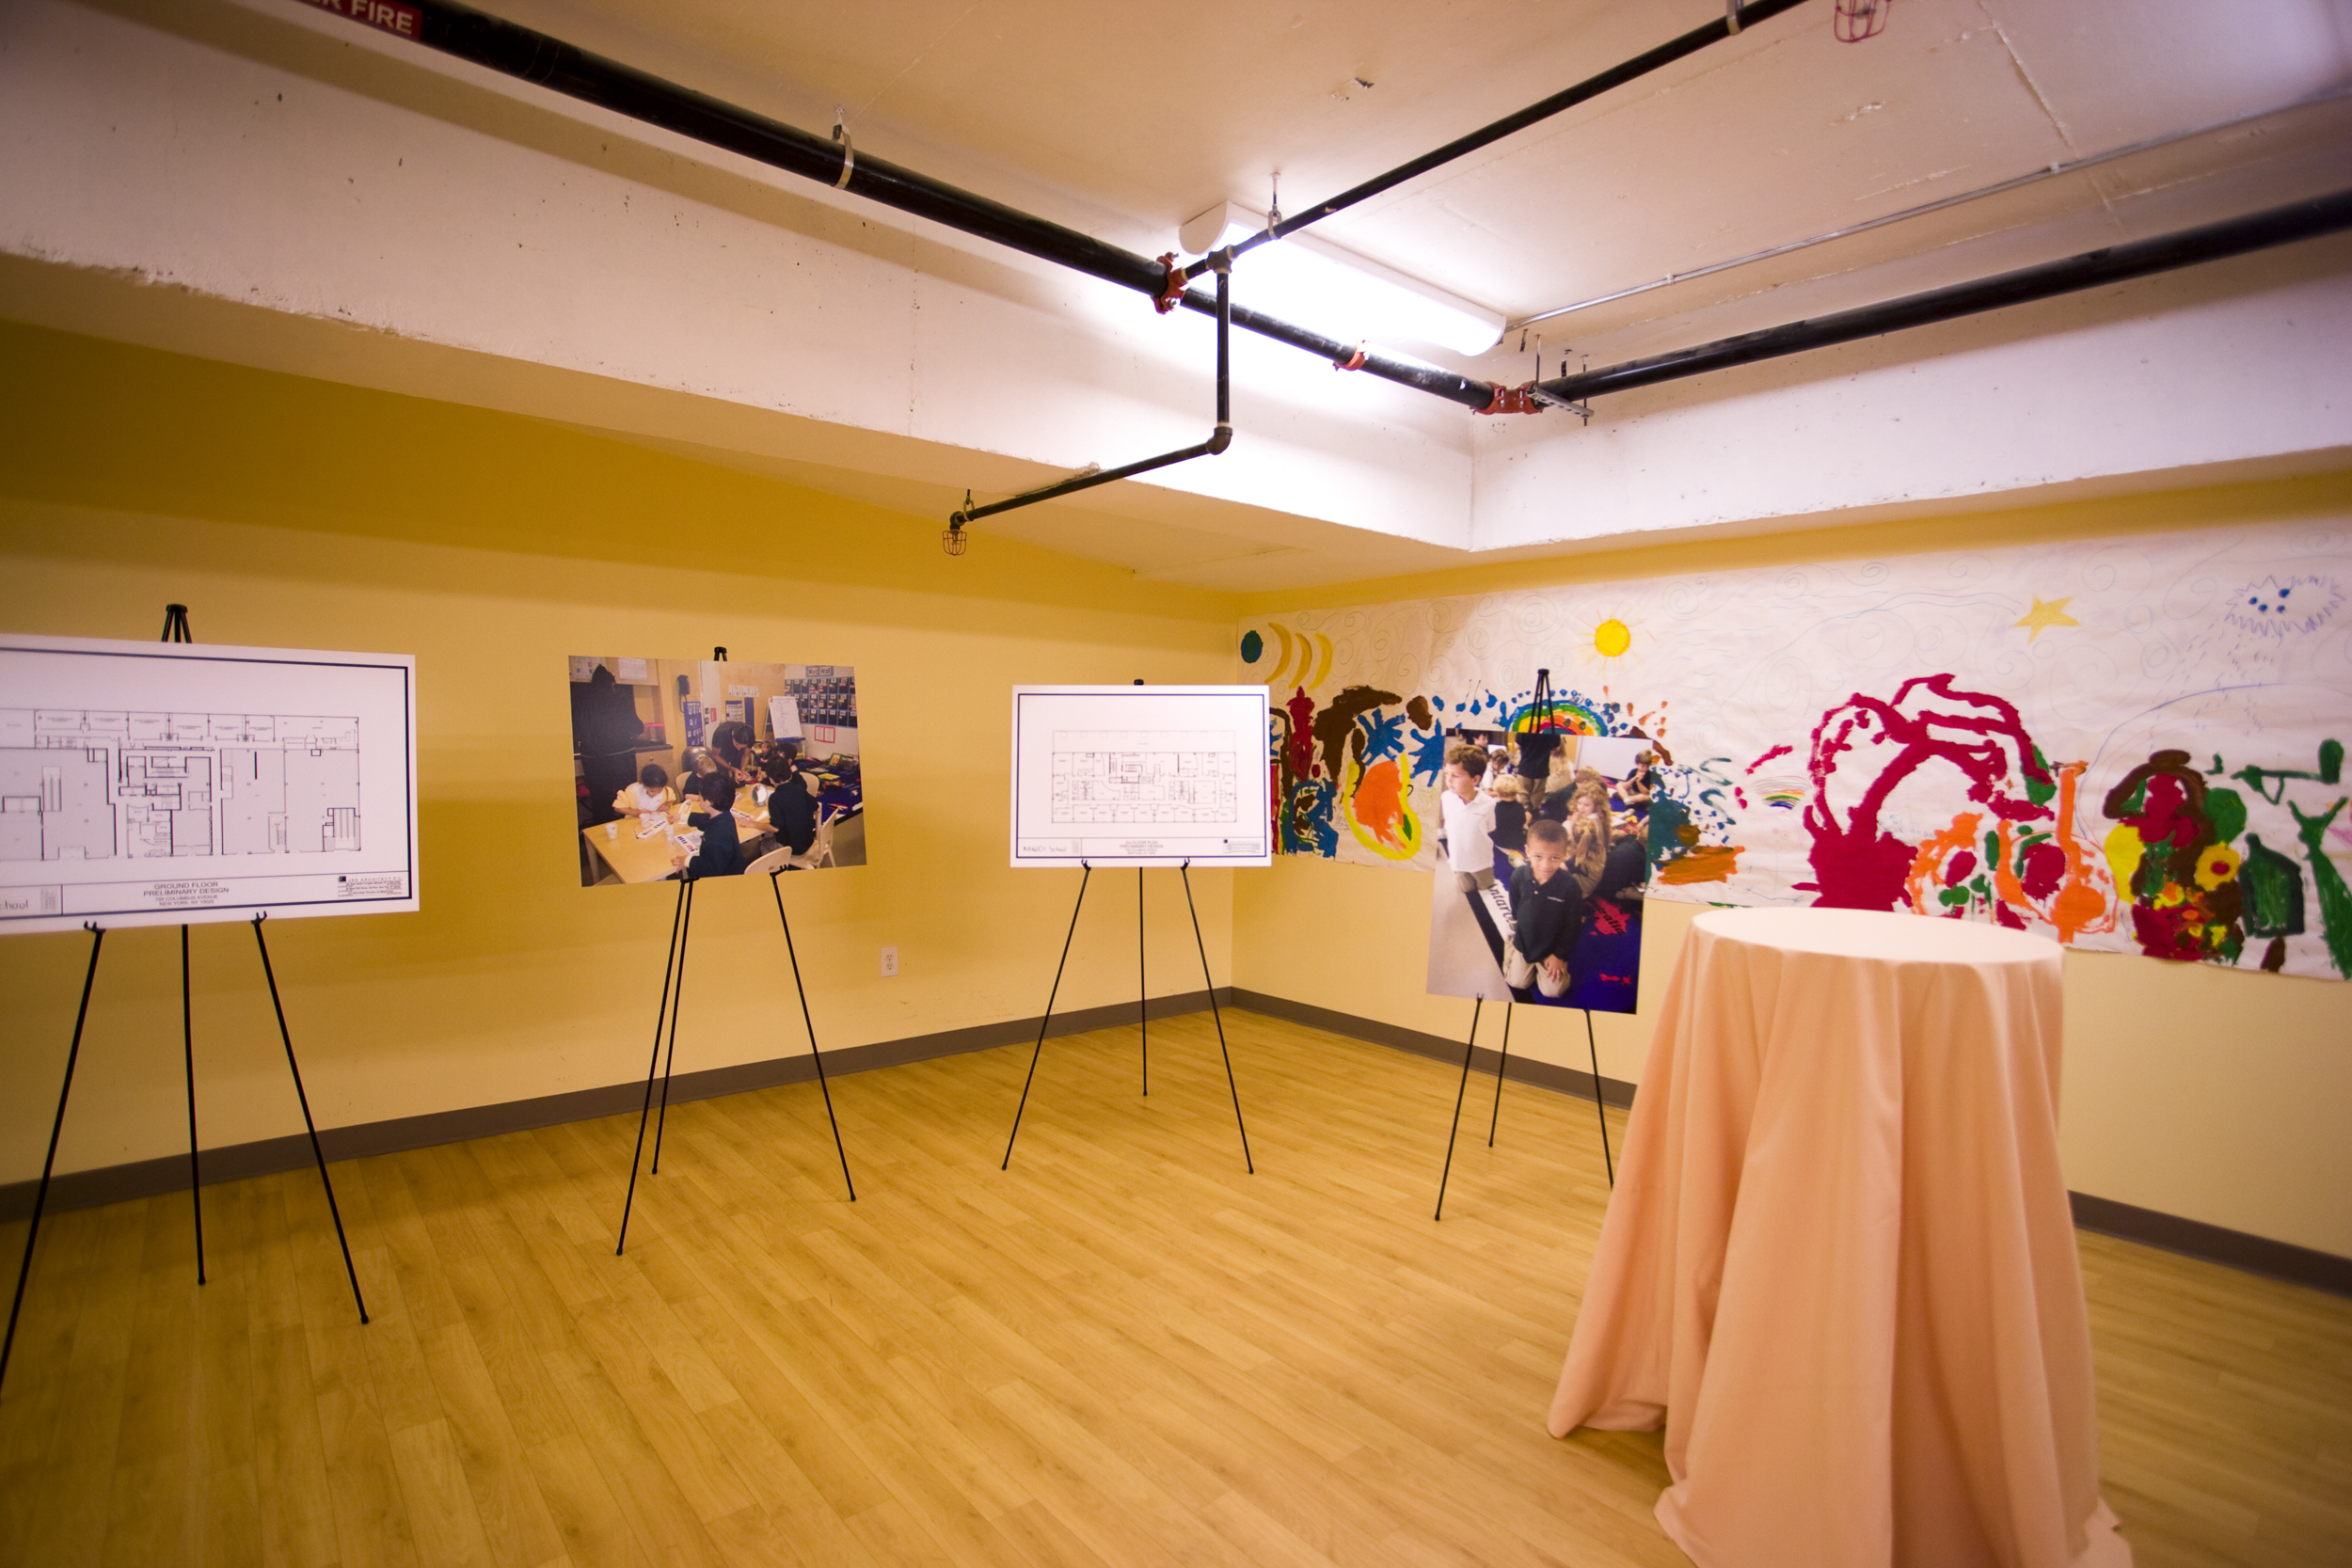 ceci_new_york_event_invitation_the_mandell_school_new_york_city_opening_creative_elementary_kindergarden_middle_school_nyc-21.jpg